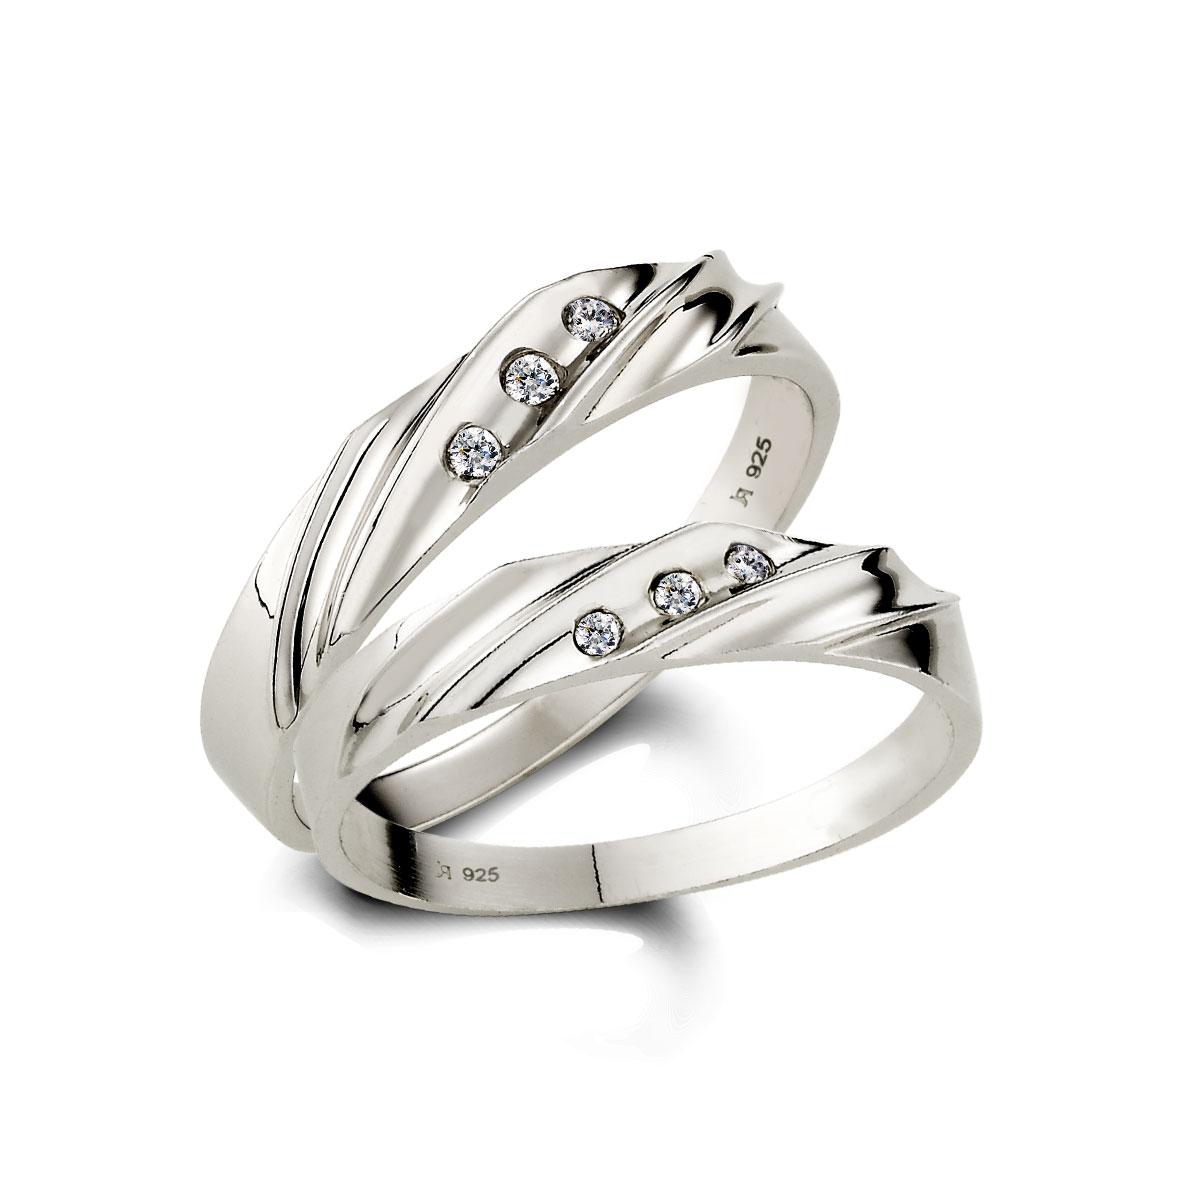 KSH32 愛的蜜糖流線感情侶戒指